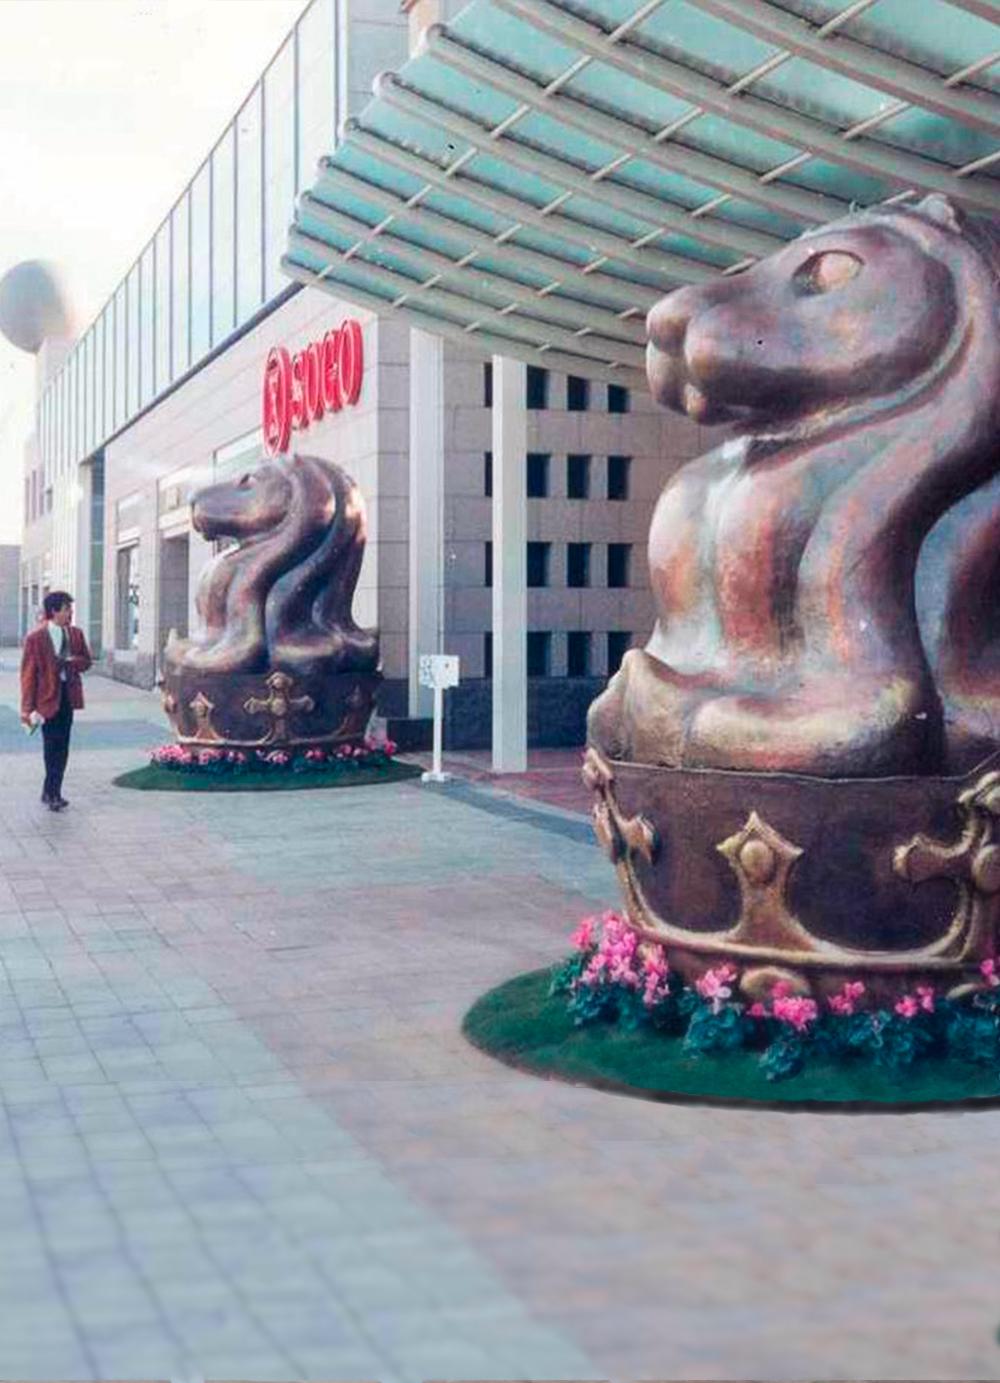 Escultura-Encargos-Hotel-Arts-D-RD.Escultor